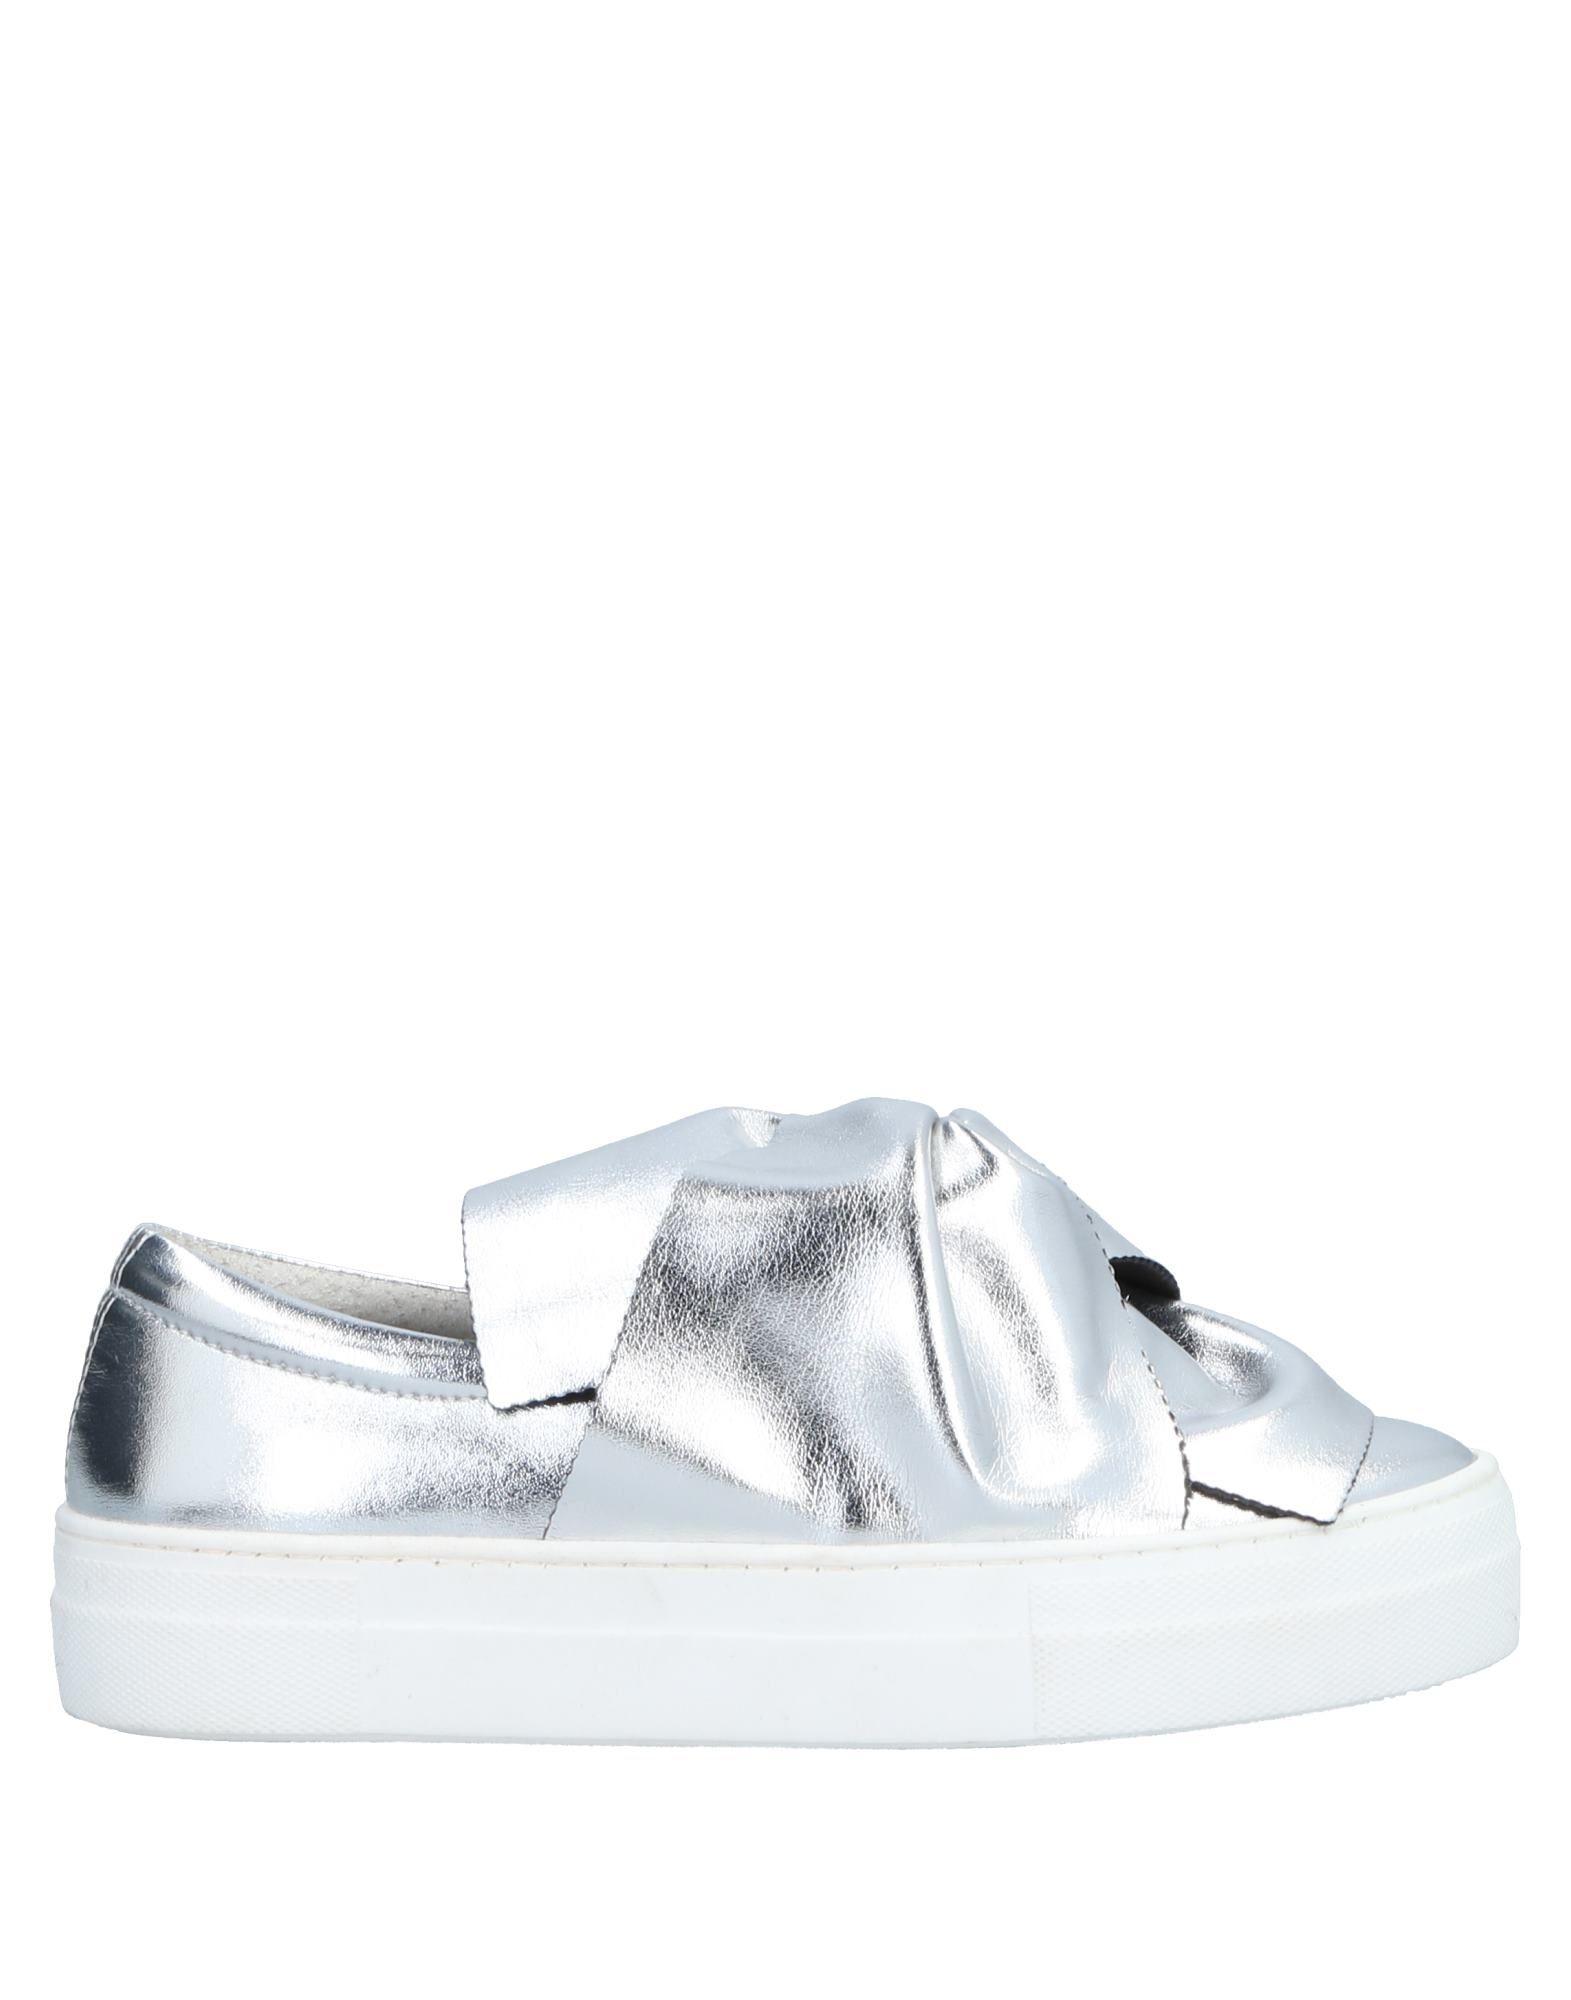 Lea 11543363VC Gute Qualität beliebte Schuhe